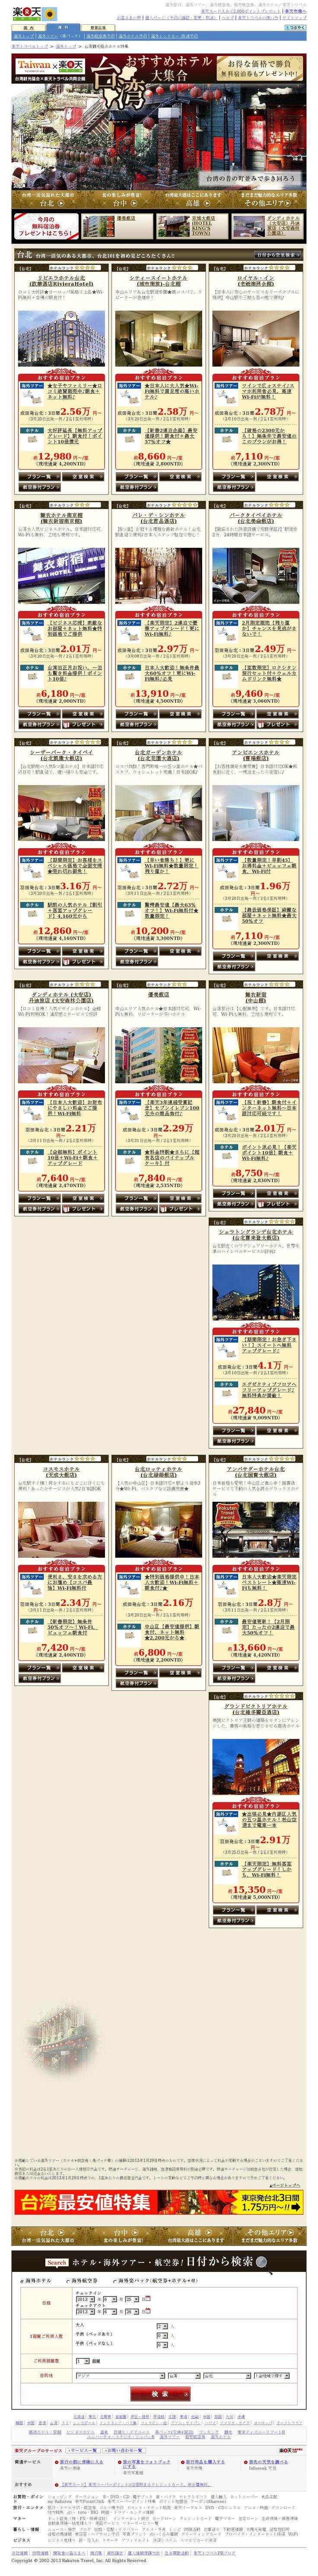 【D/C】【広告】台湾ホテルピックアップ特集×政観2月号(更新)<2013/02/06>